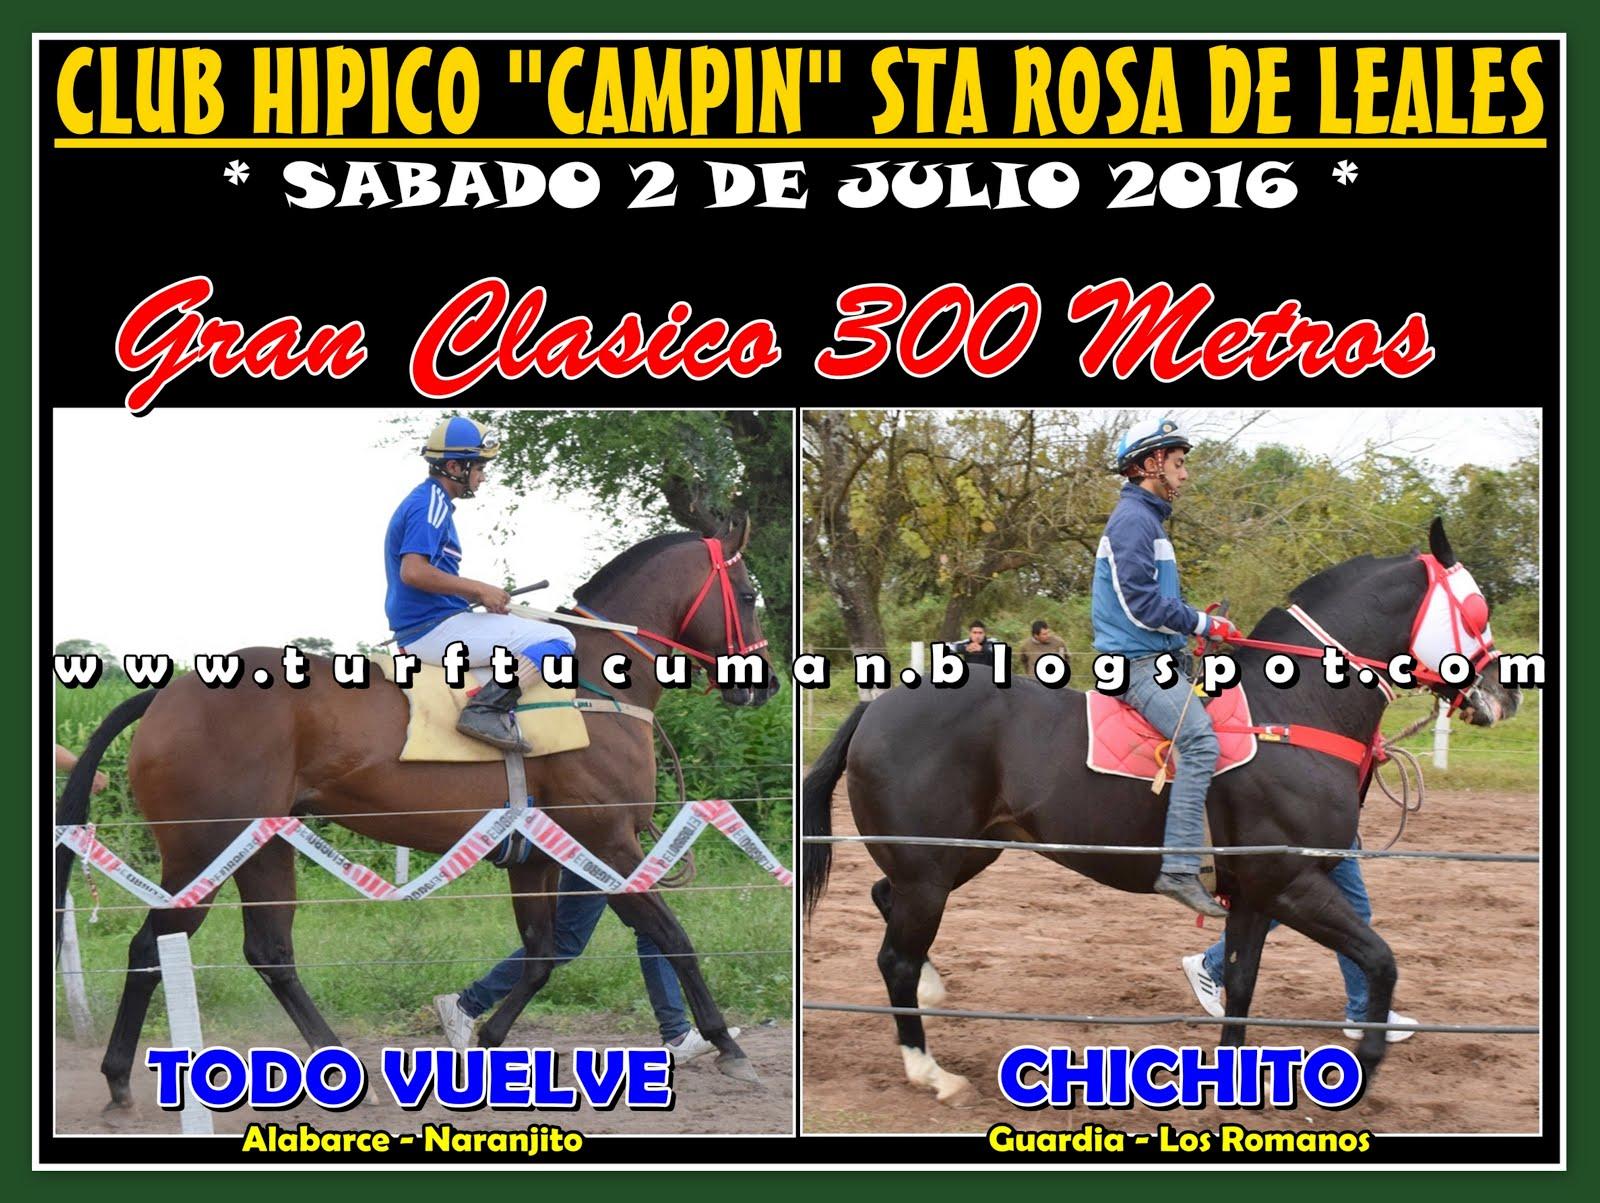 TODO VUELVE VS CHICHITO